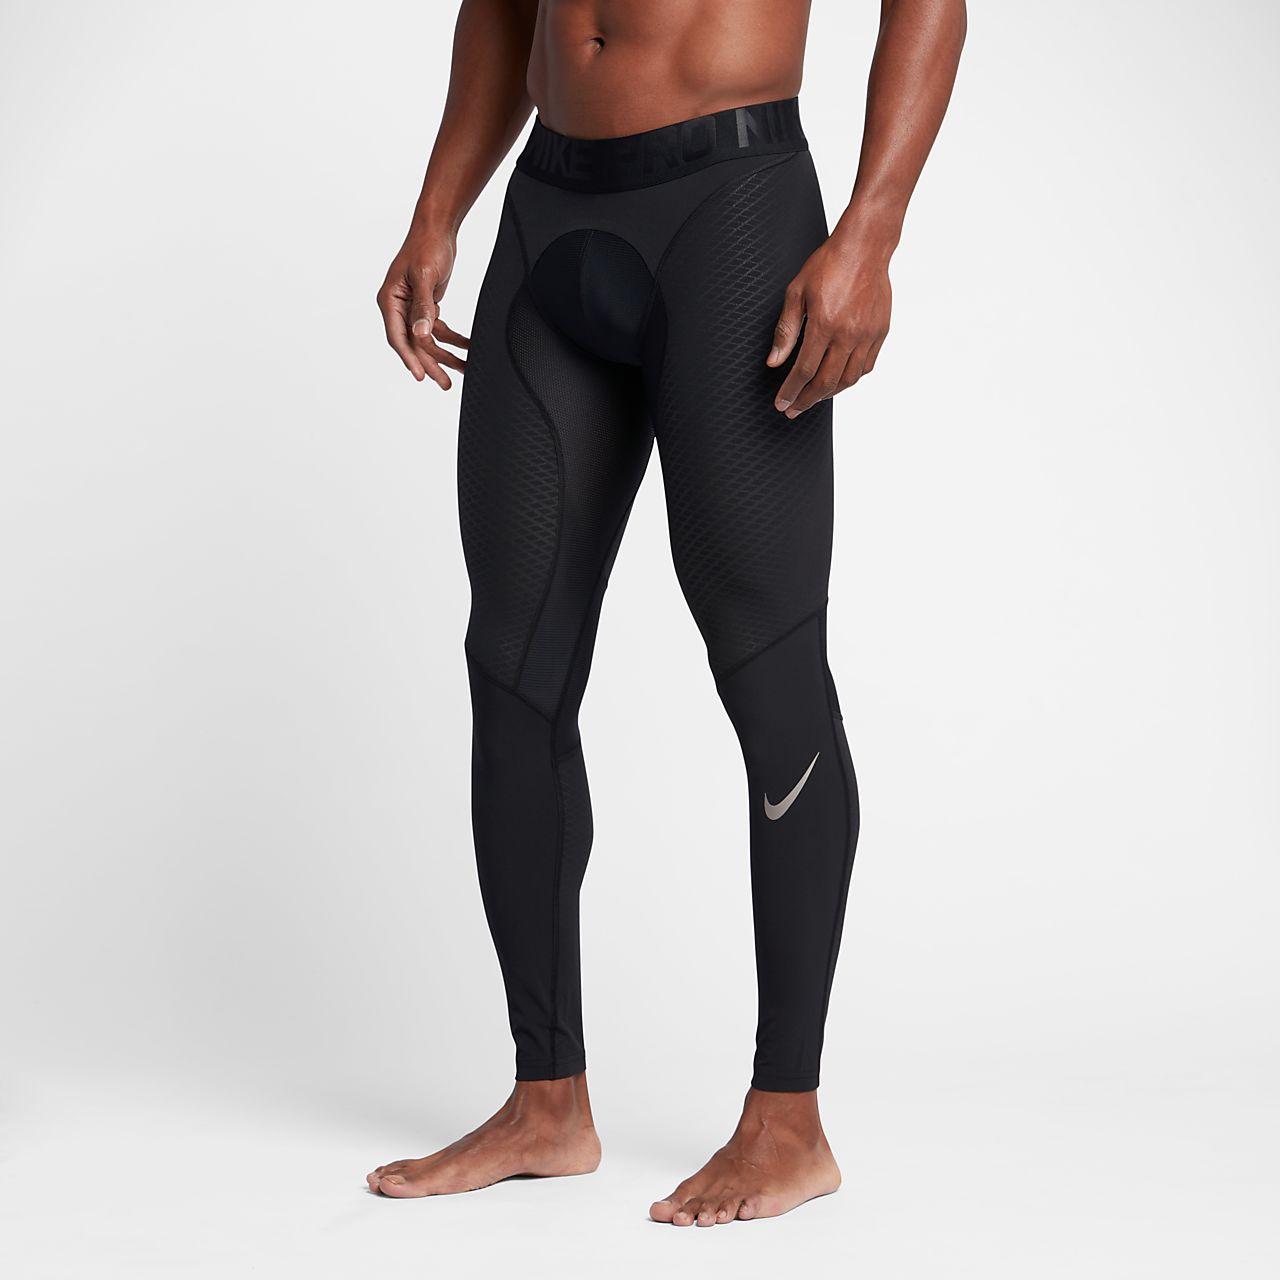 nike pro zonal strength men 39 s training tights gb. Black Bedroom Furniture Sets. Home Design Ideas